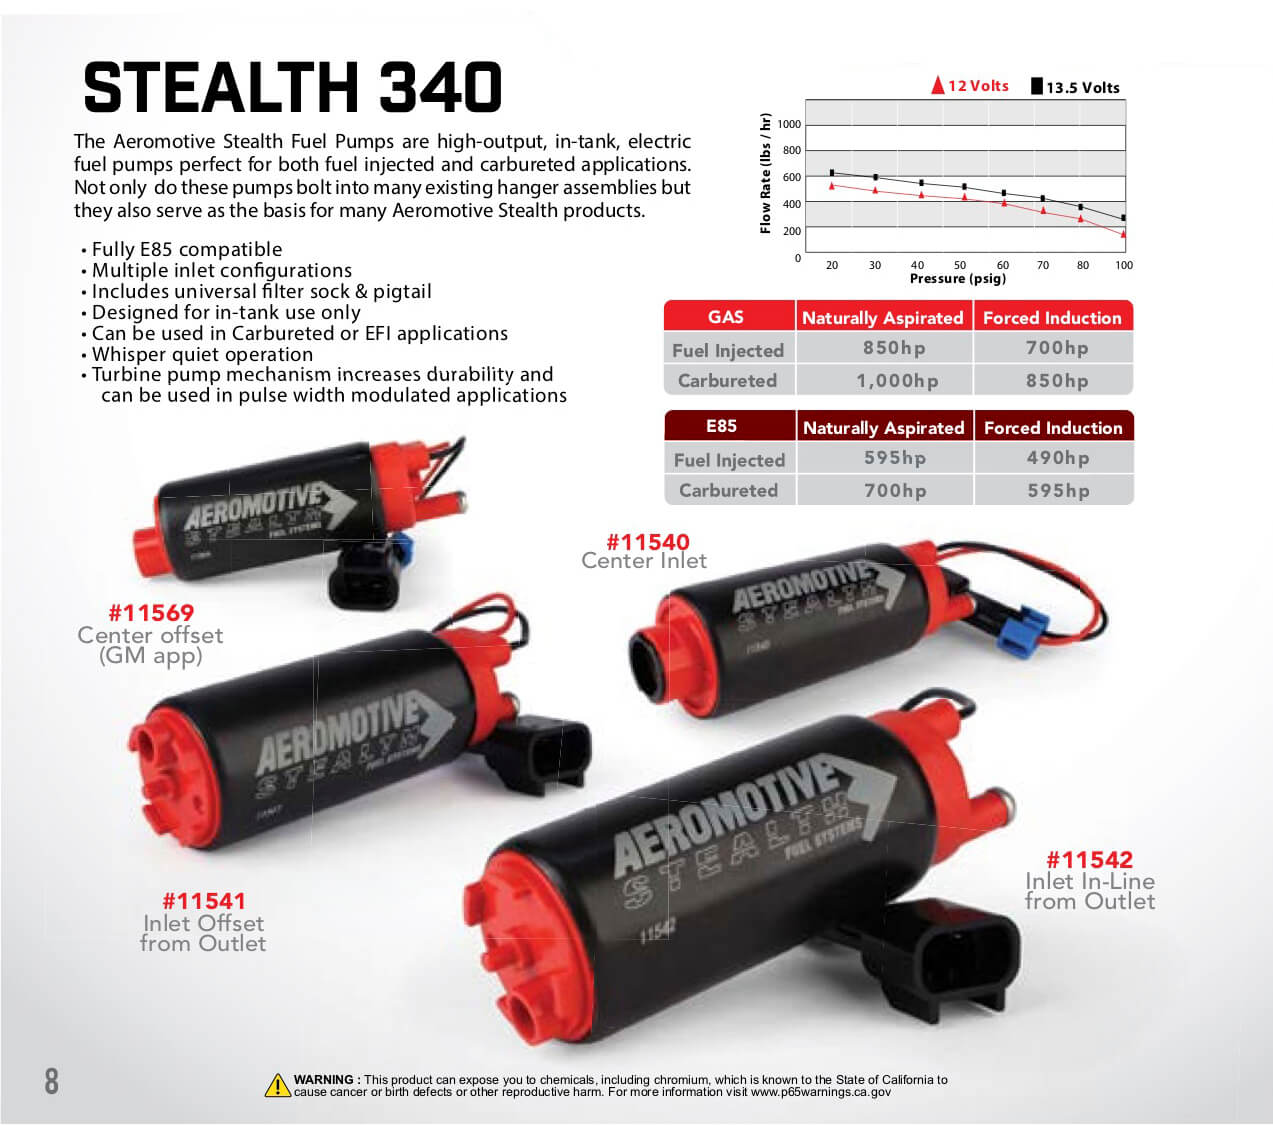 340 Fuel Pump, Center Inlet